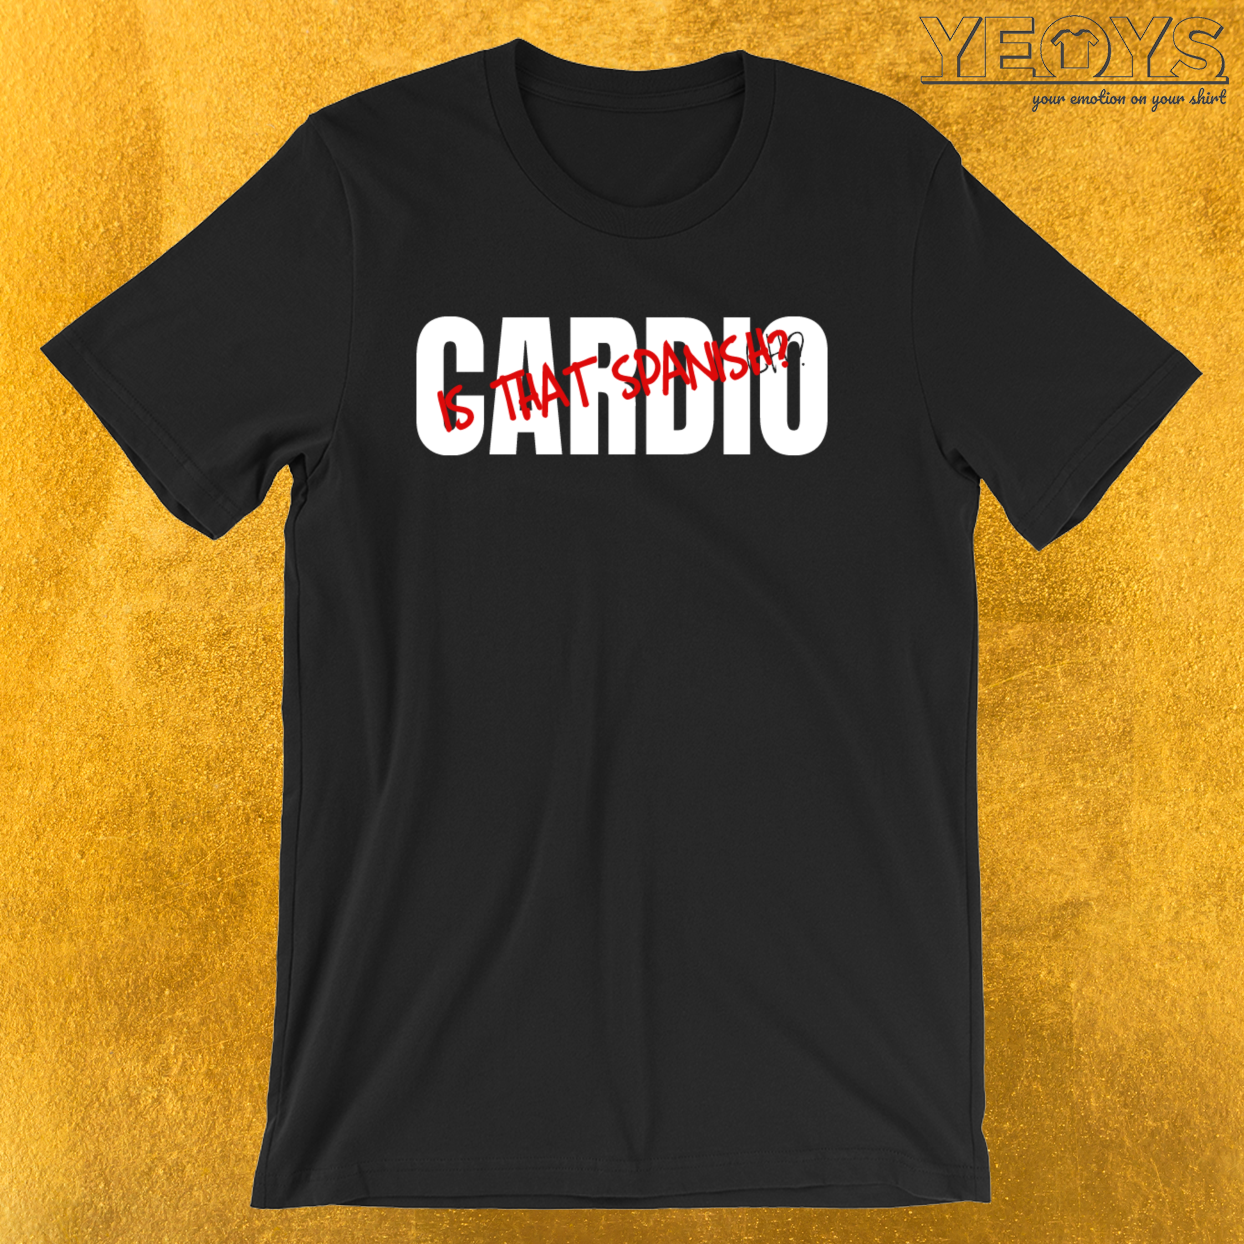 Cardio Is that Spanish – Cardio Tee